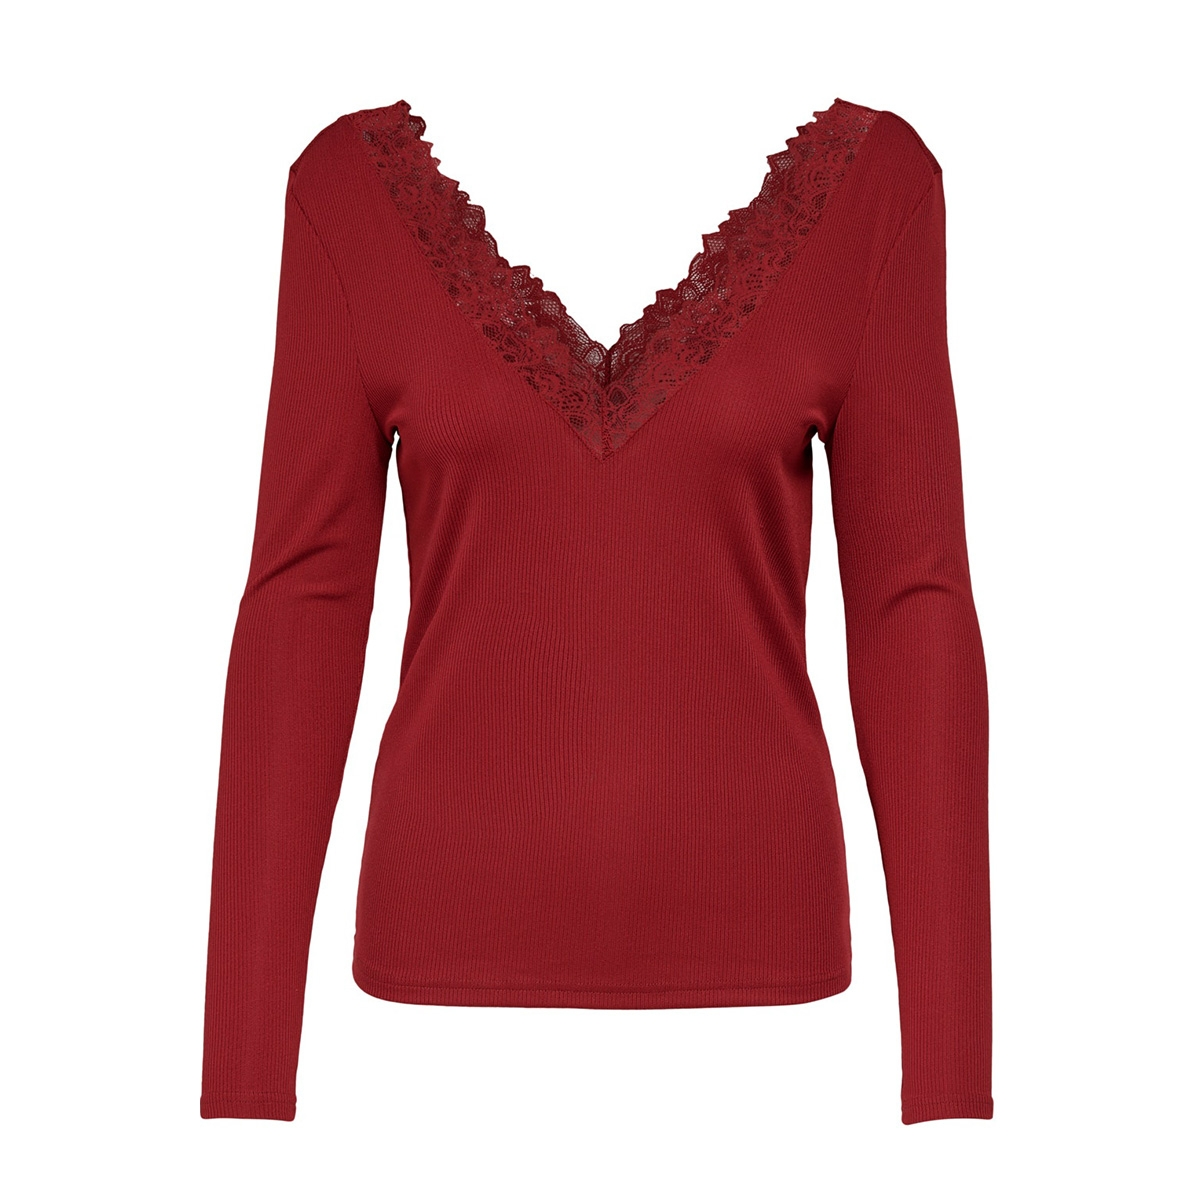 onlrio l/s v-neck top jrs 15193063 only t-shirt rio red/dtm lace